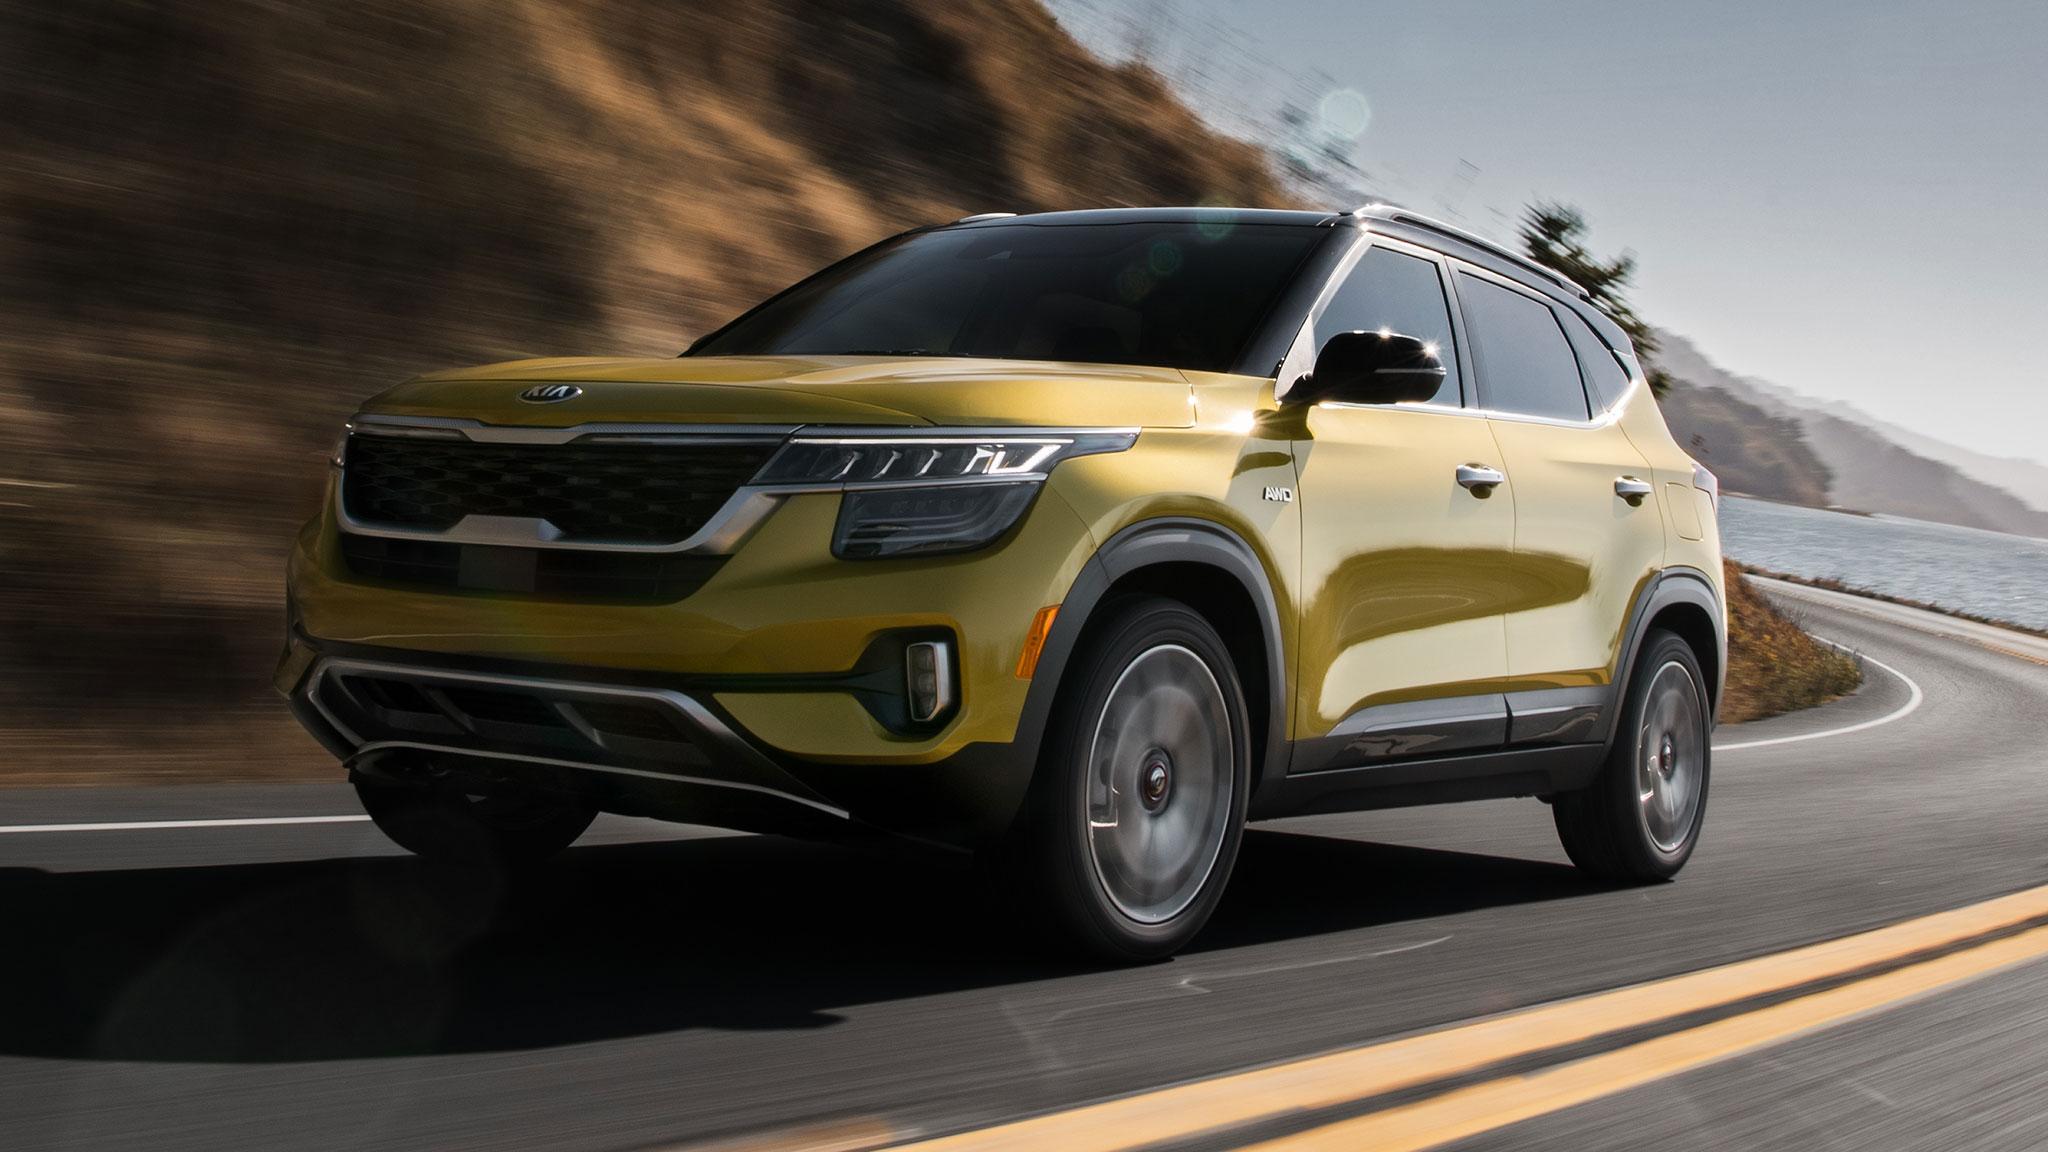 2021 Kia Seltos Compact SUV Puts on a Refined Face ...